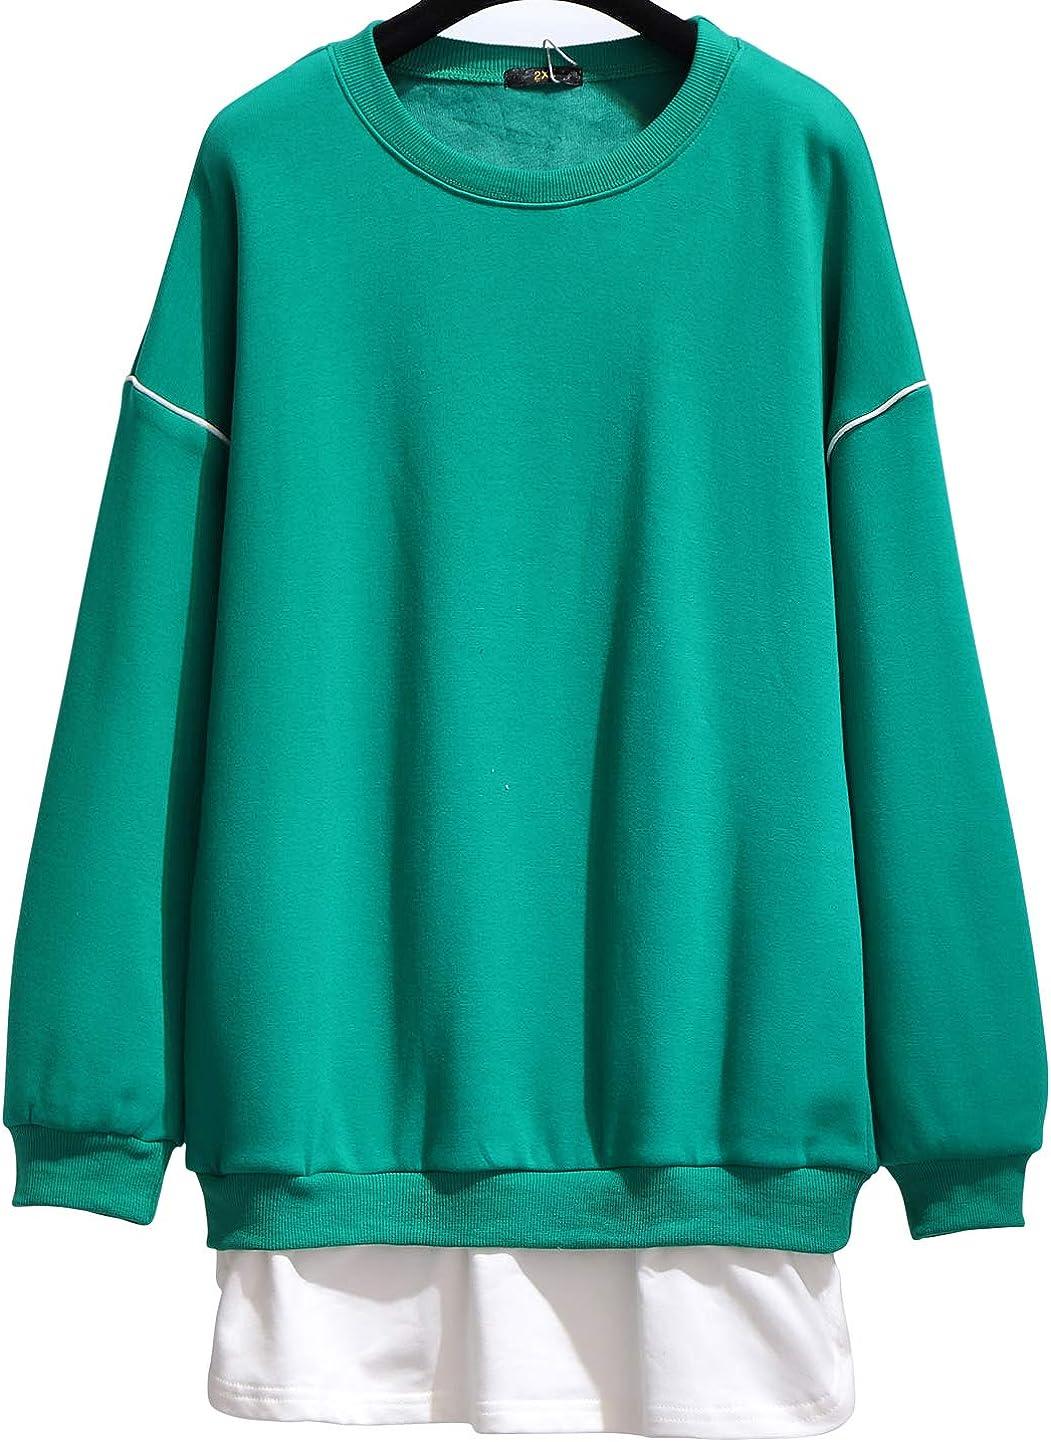 chouyatou Women's Casual Long Sleeve Baggy Plus Size Fleece Lined Fake Twinset Pullover Sweatshirt Tops